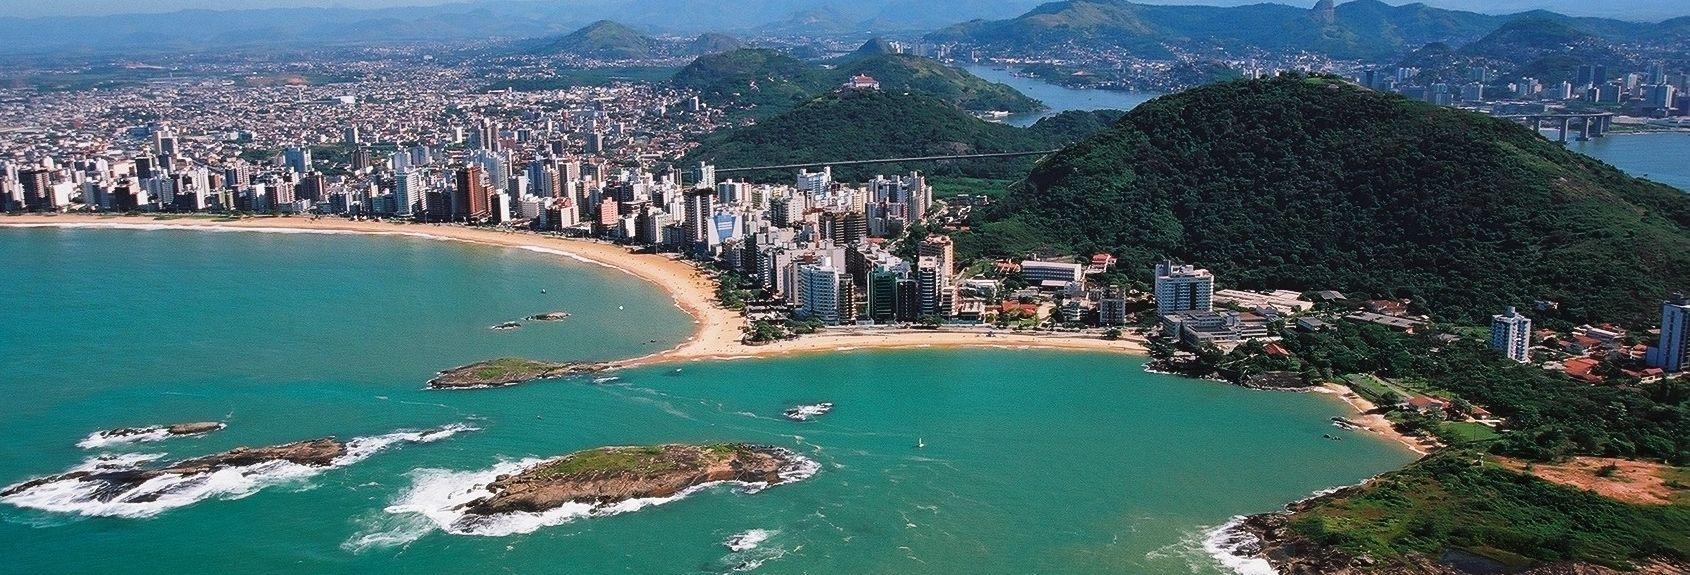 Praia da Costa Mall, Vila Velha, Bundesstaat Espírito Santo, Brasilien